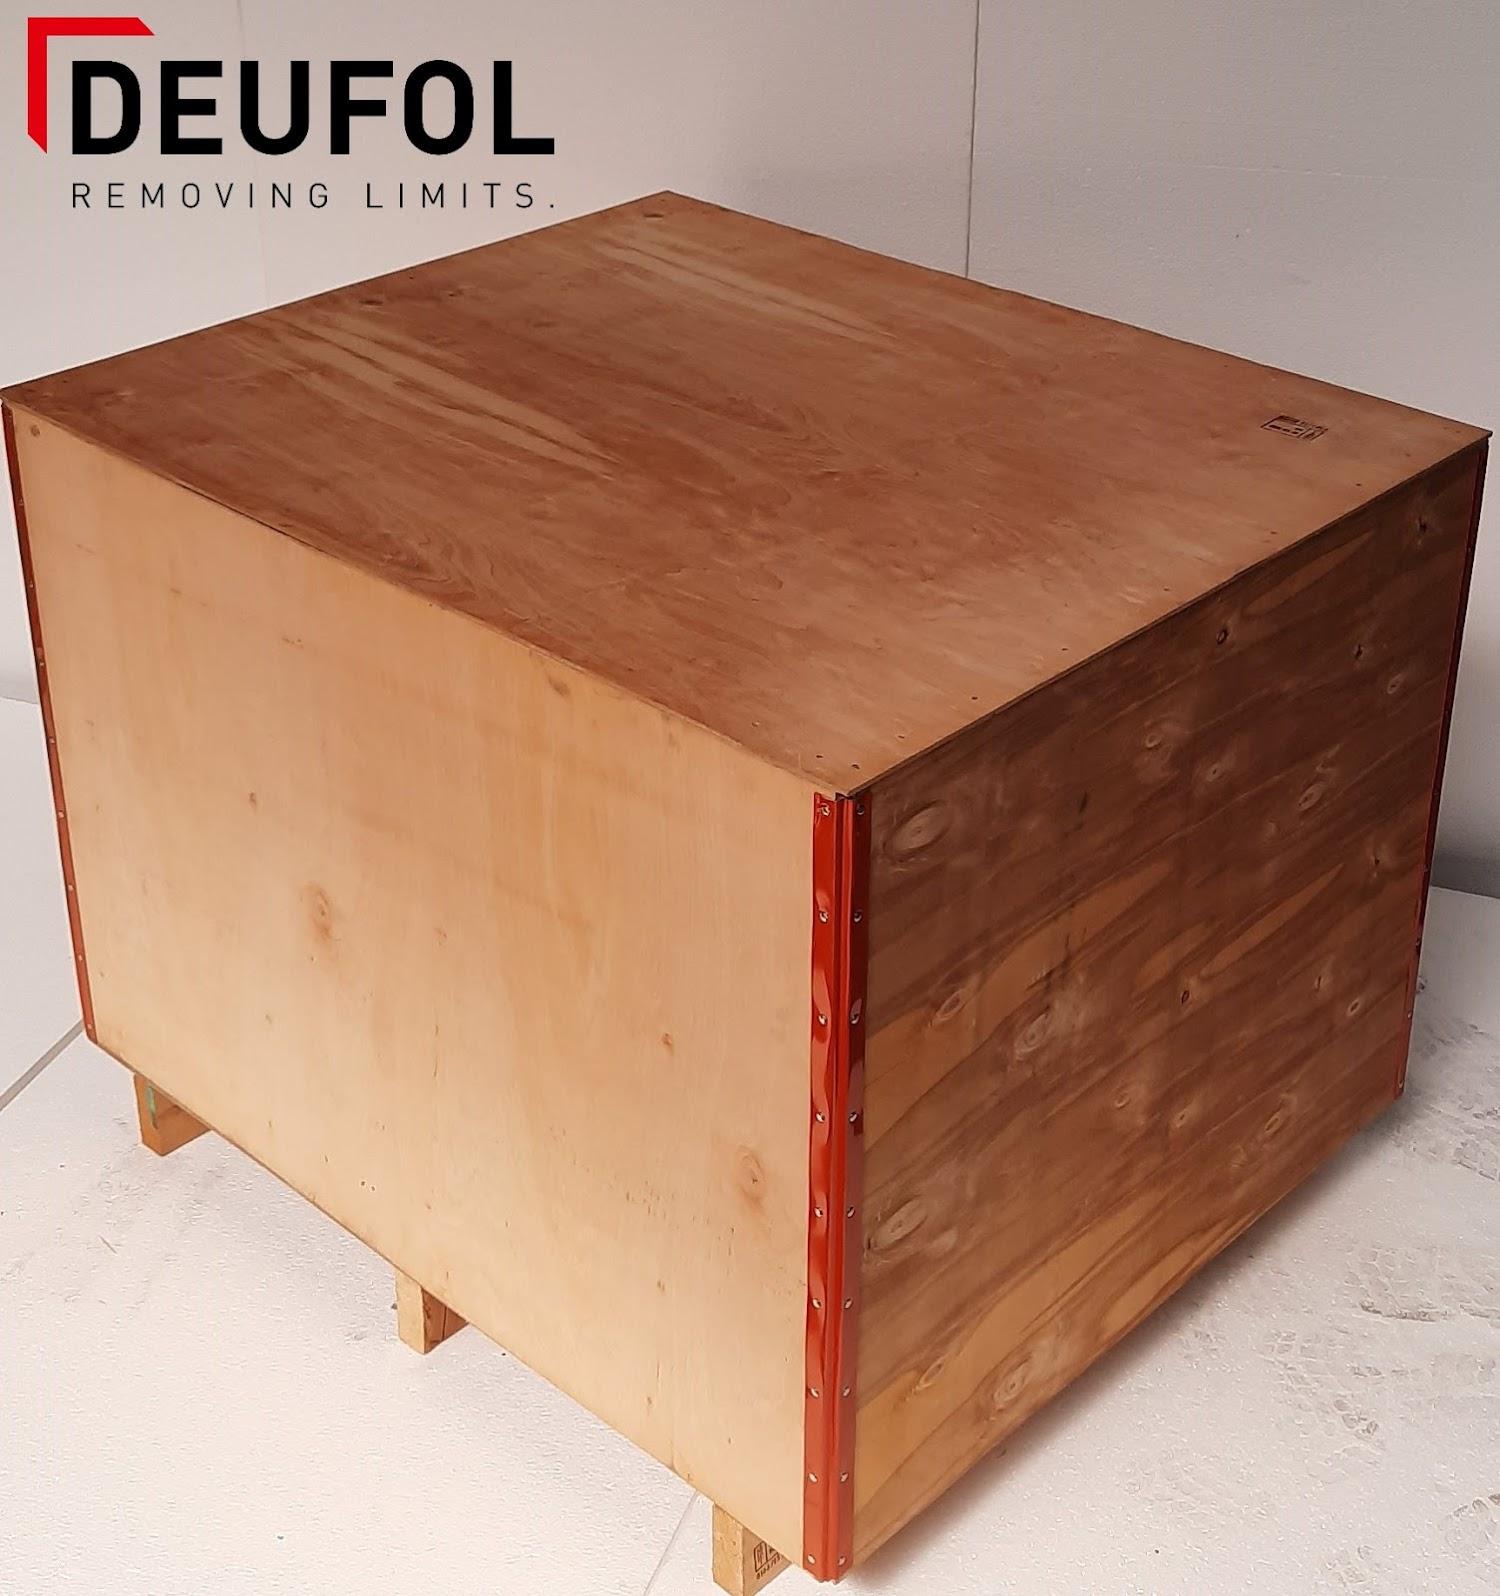 Houten transportkist met deksel 120x100x92cm